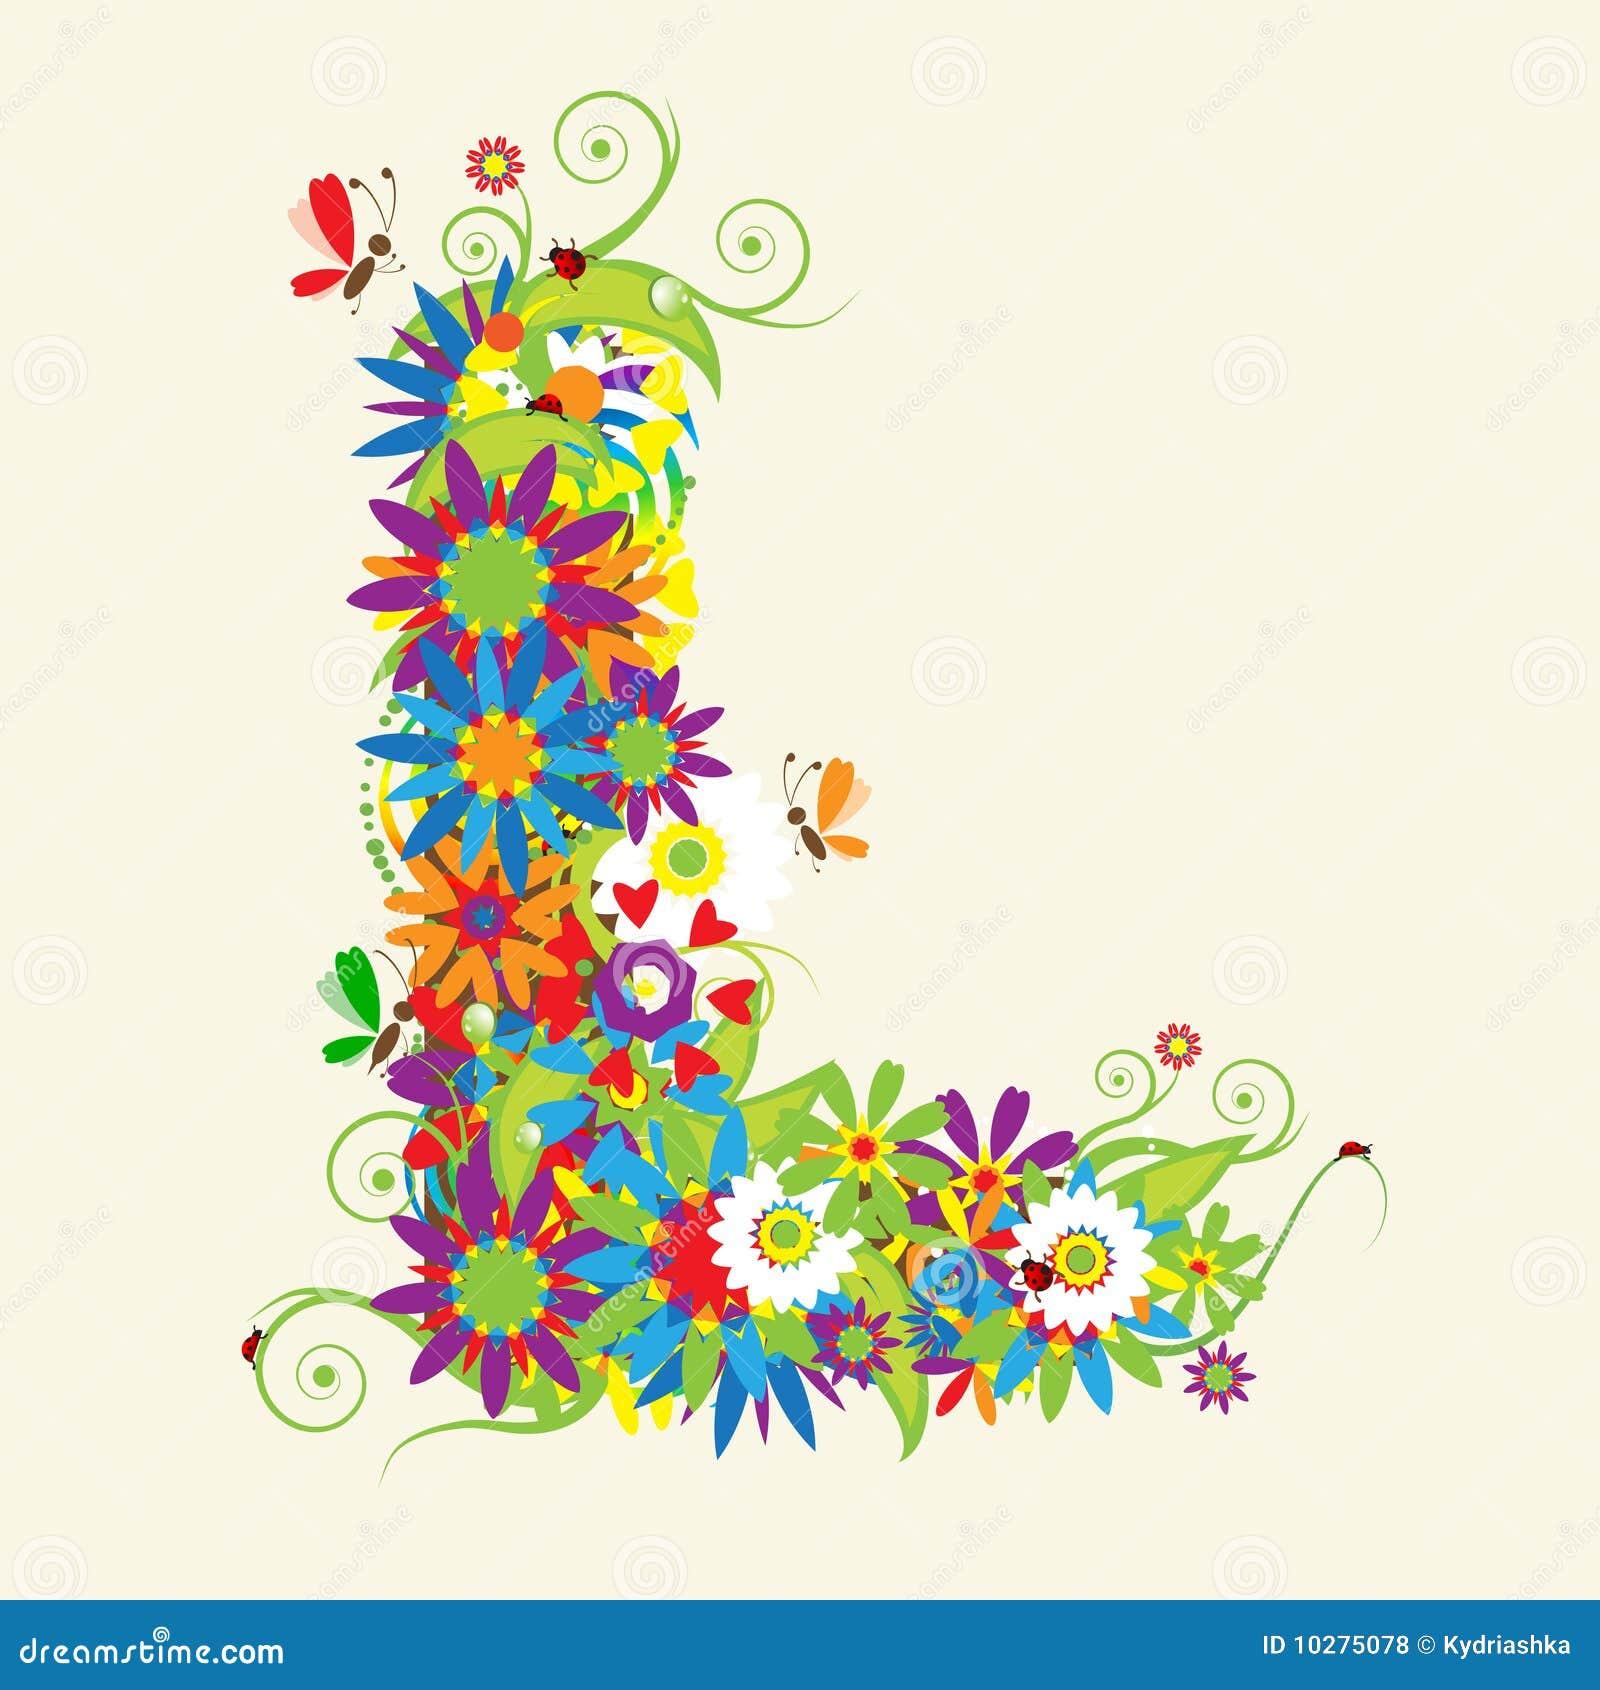 Floral Letter R Font:  Letter L, Floral Design Royalty Free Stock Photos